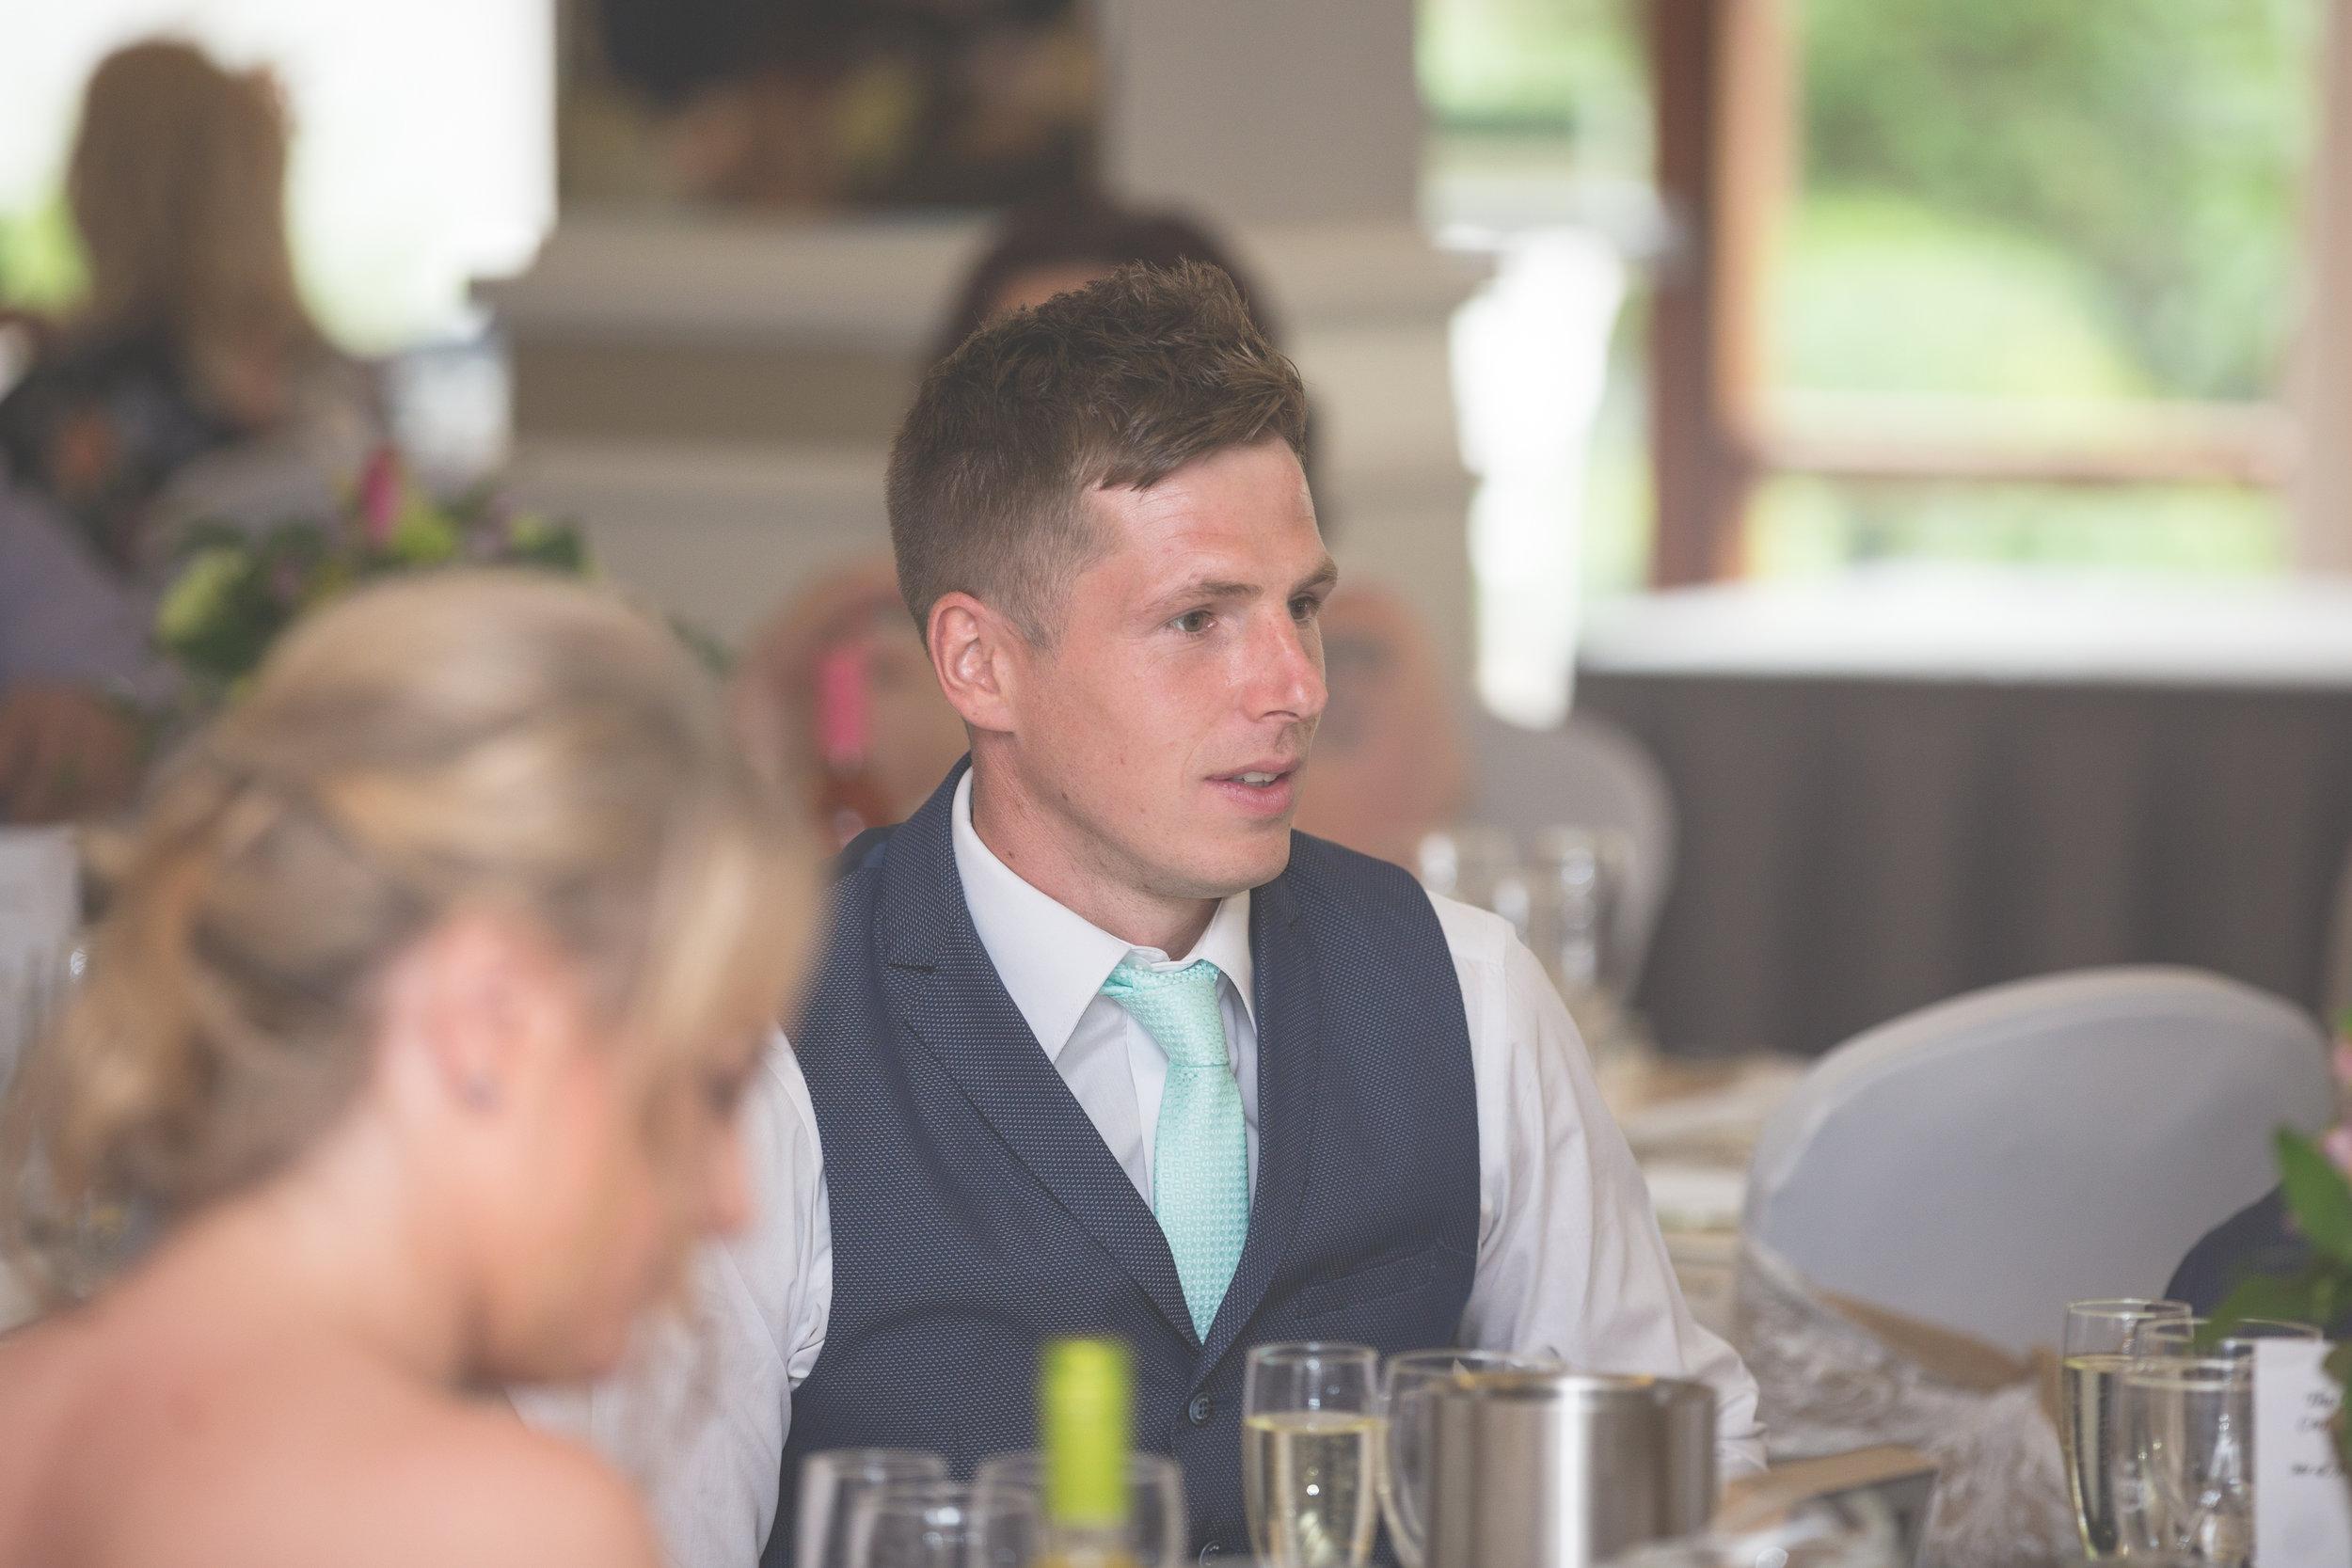 Antoinette & Stephen - Portraits | Brian McEwan Photography | Wedding Photographer Northern Ireland 124.jpg